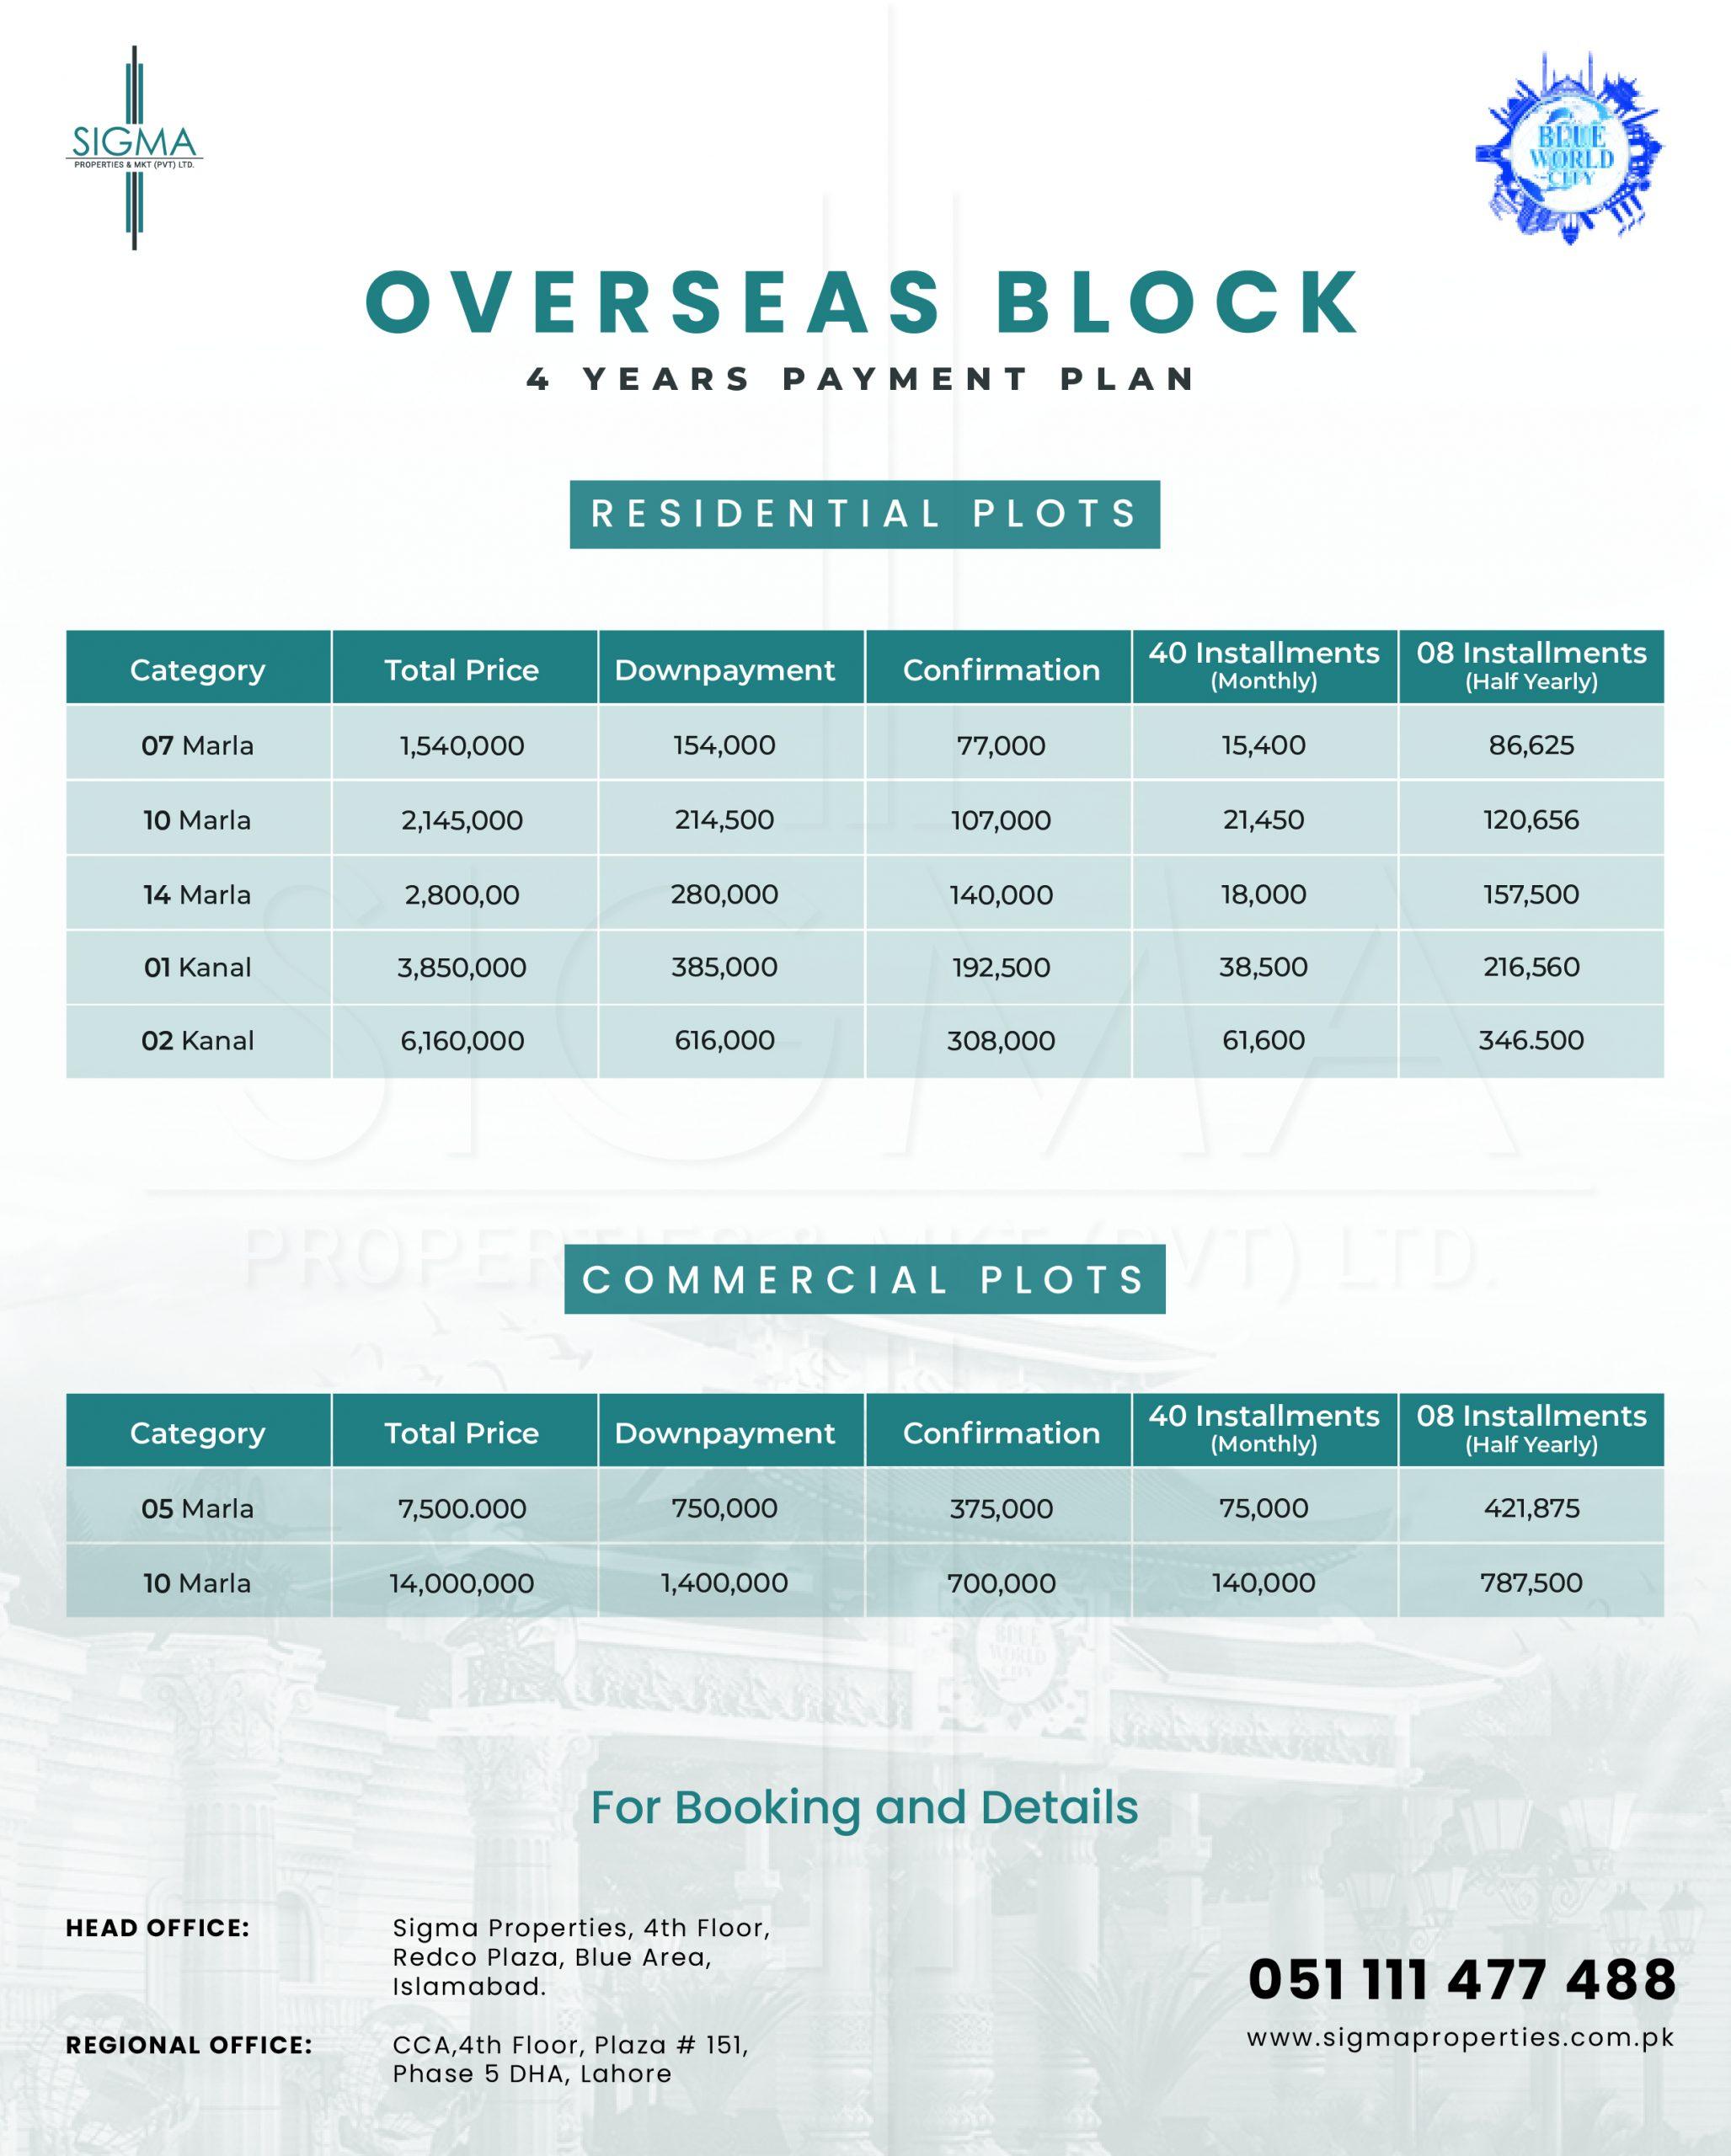 blue world city updated payment plan 2021